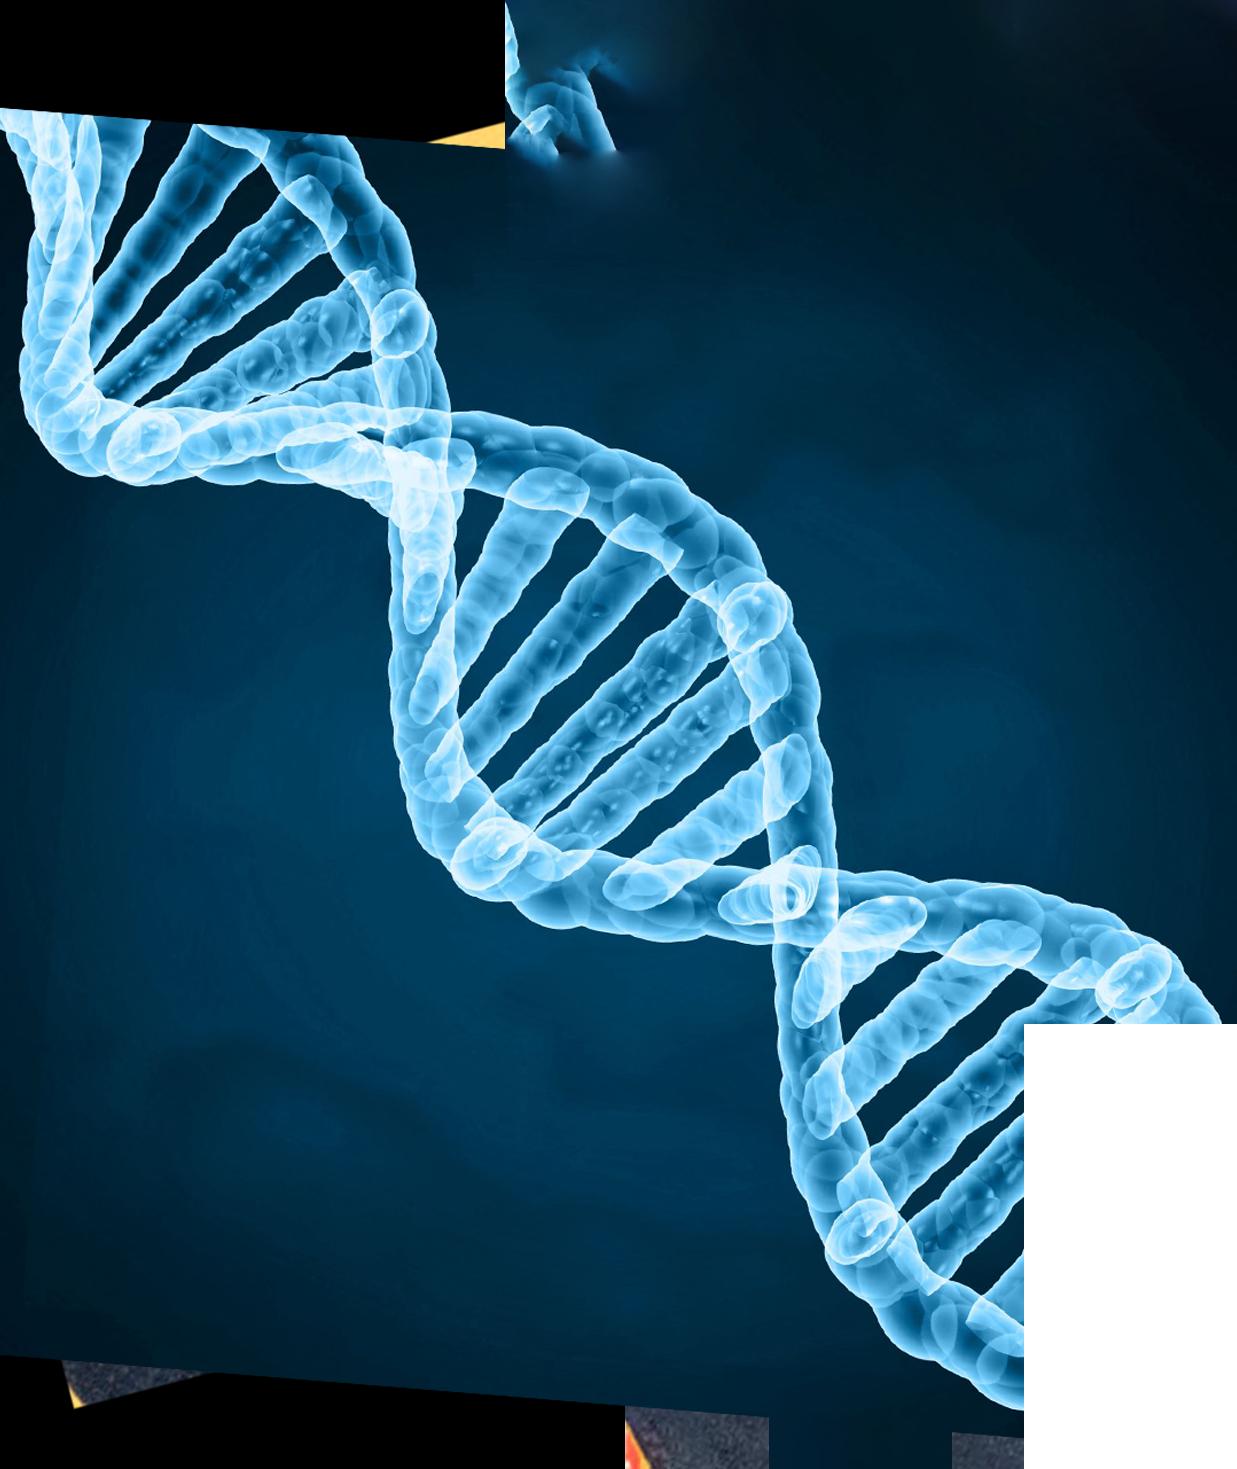 https://www.cervinfamilyoffice.com/wp-content/uploads/2021/06/Shape1_DNA.png